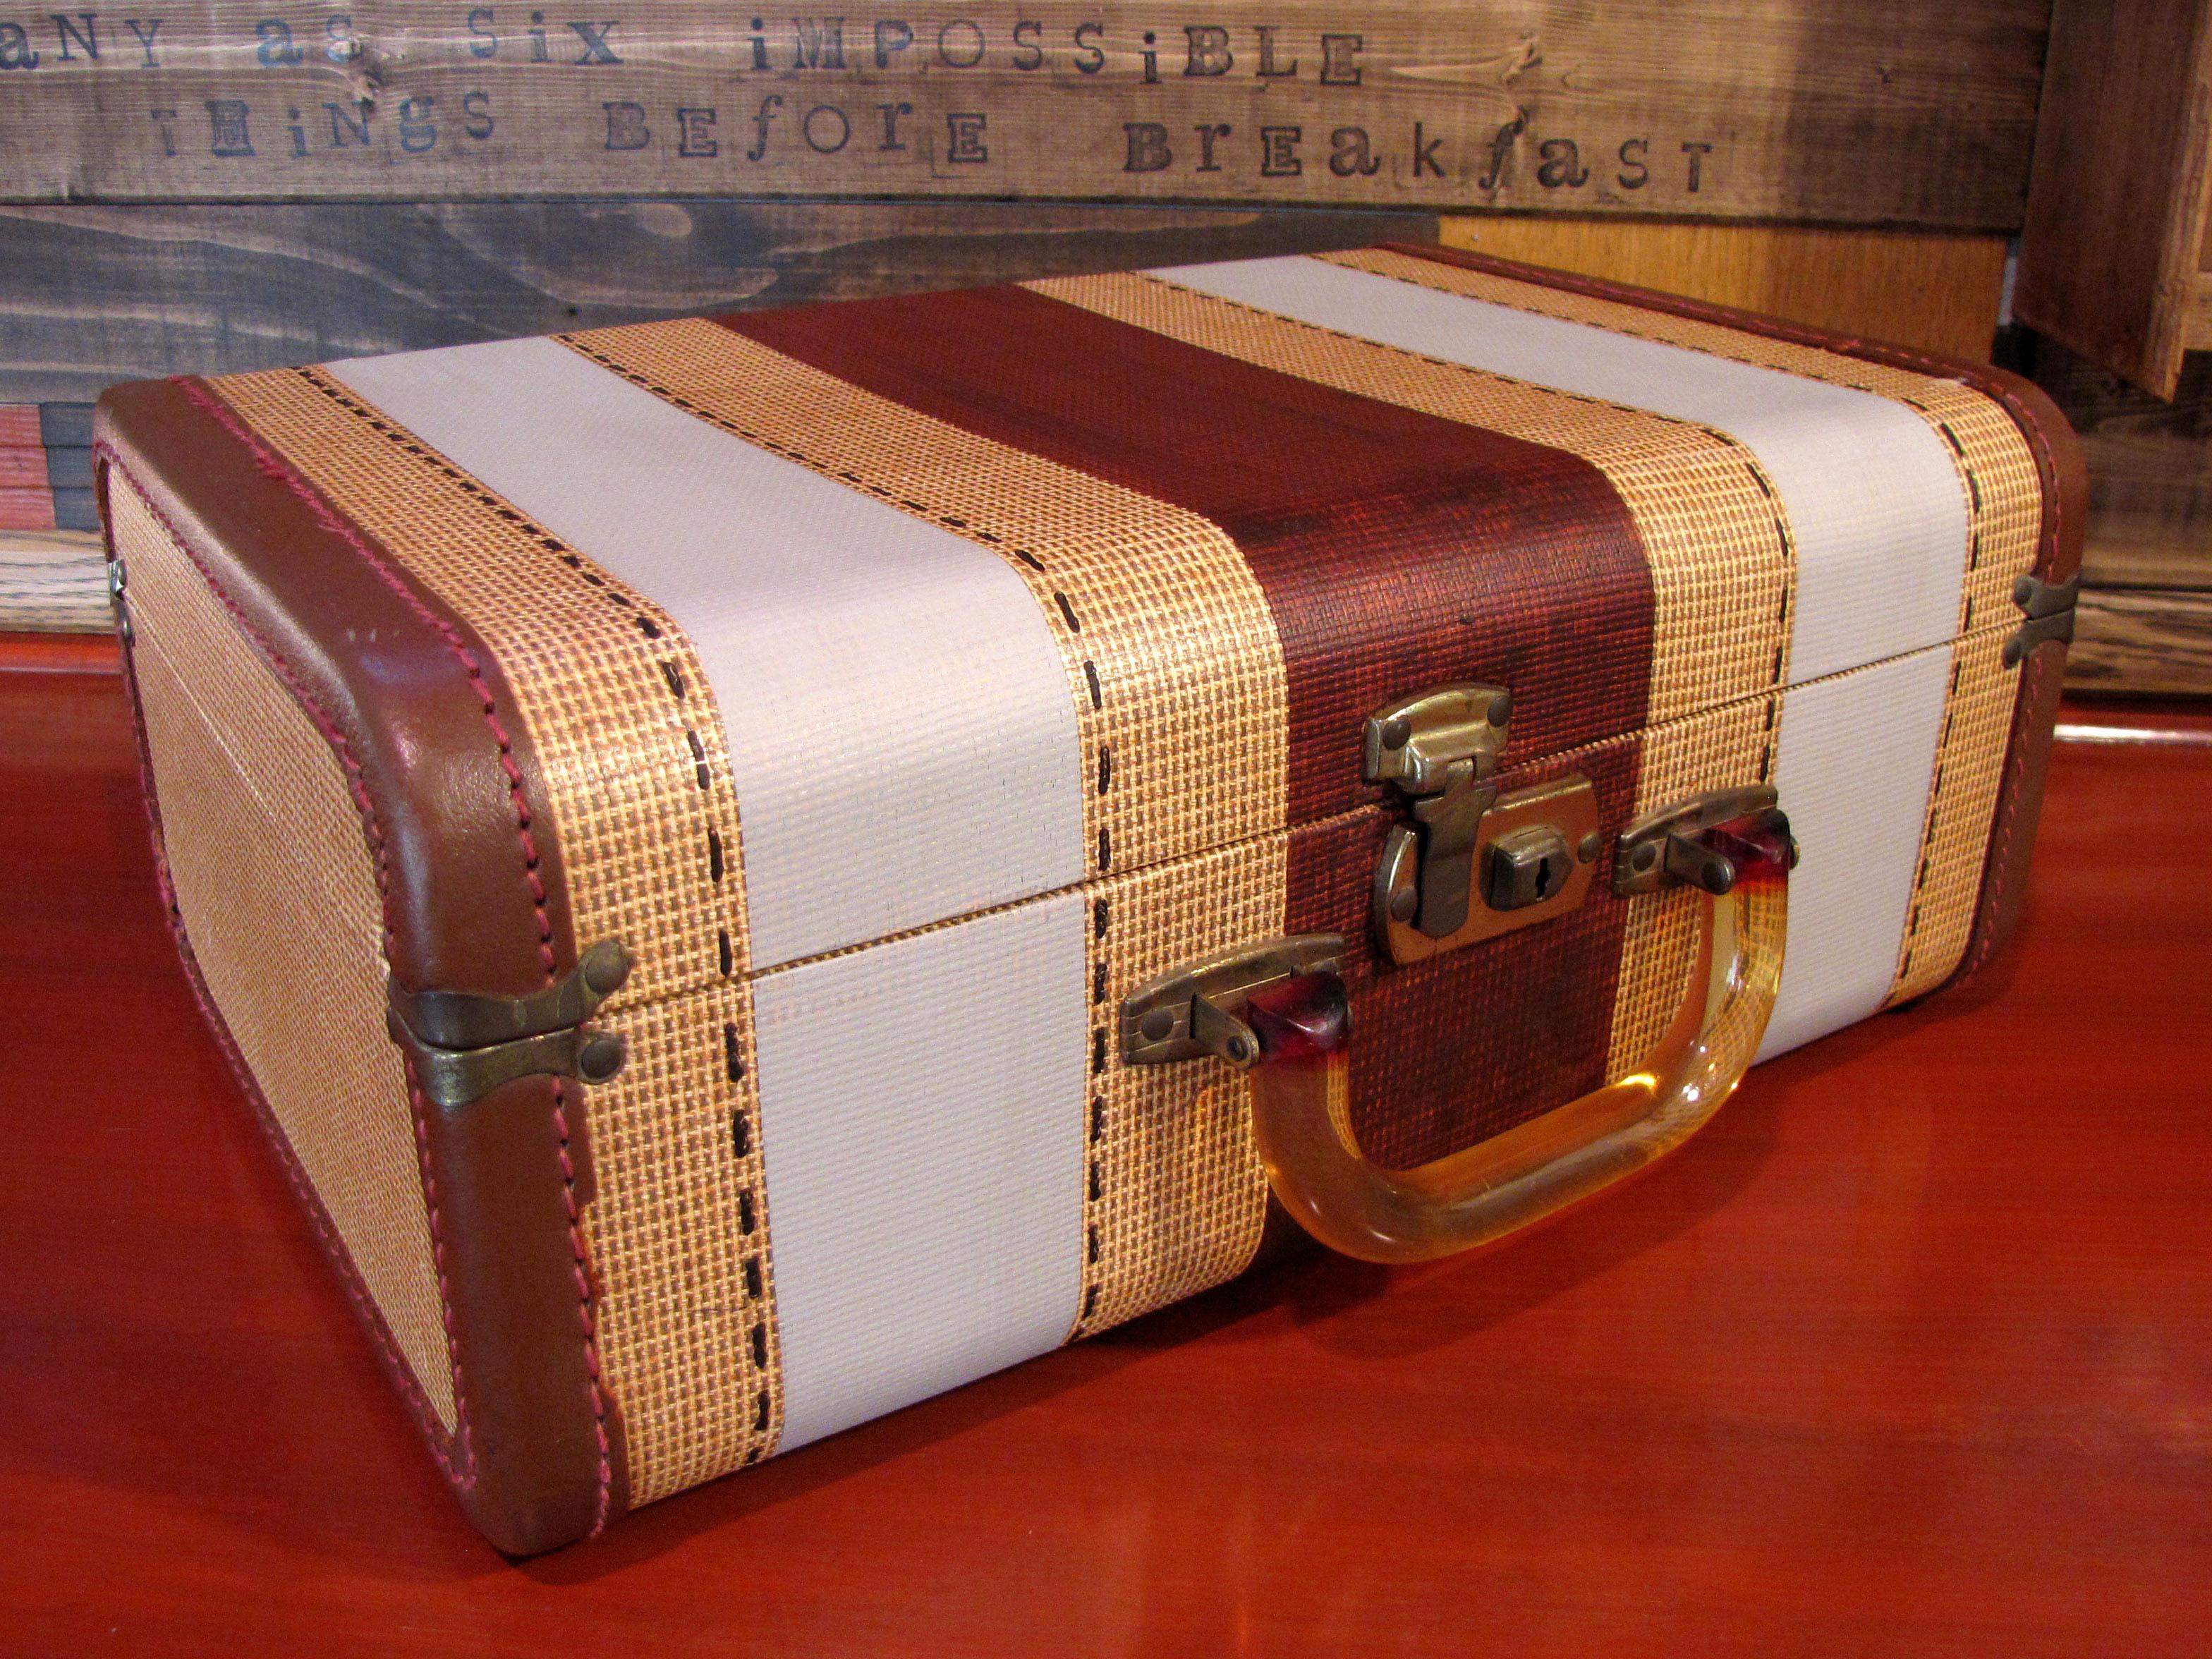 Vintage suitcase with painted details destashio for The vintage suitcase